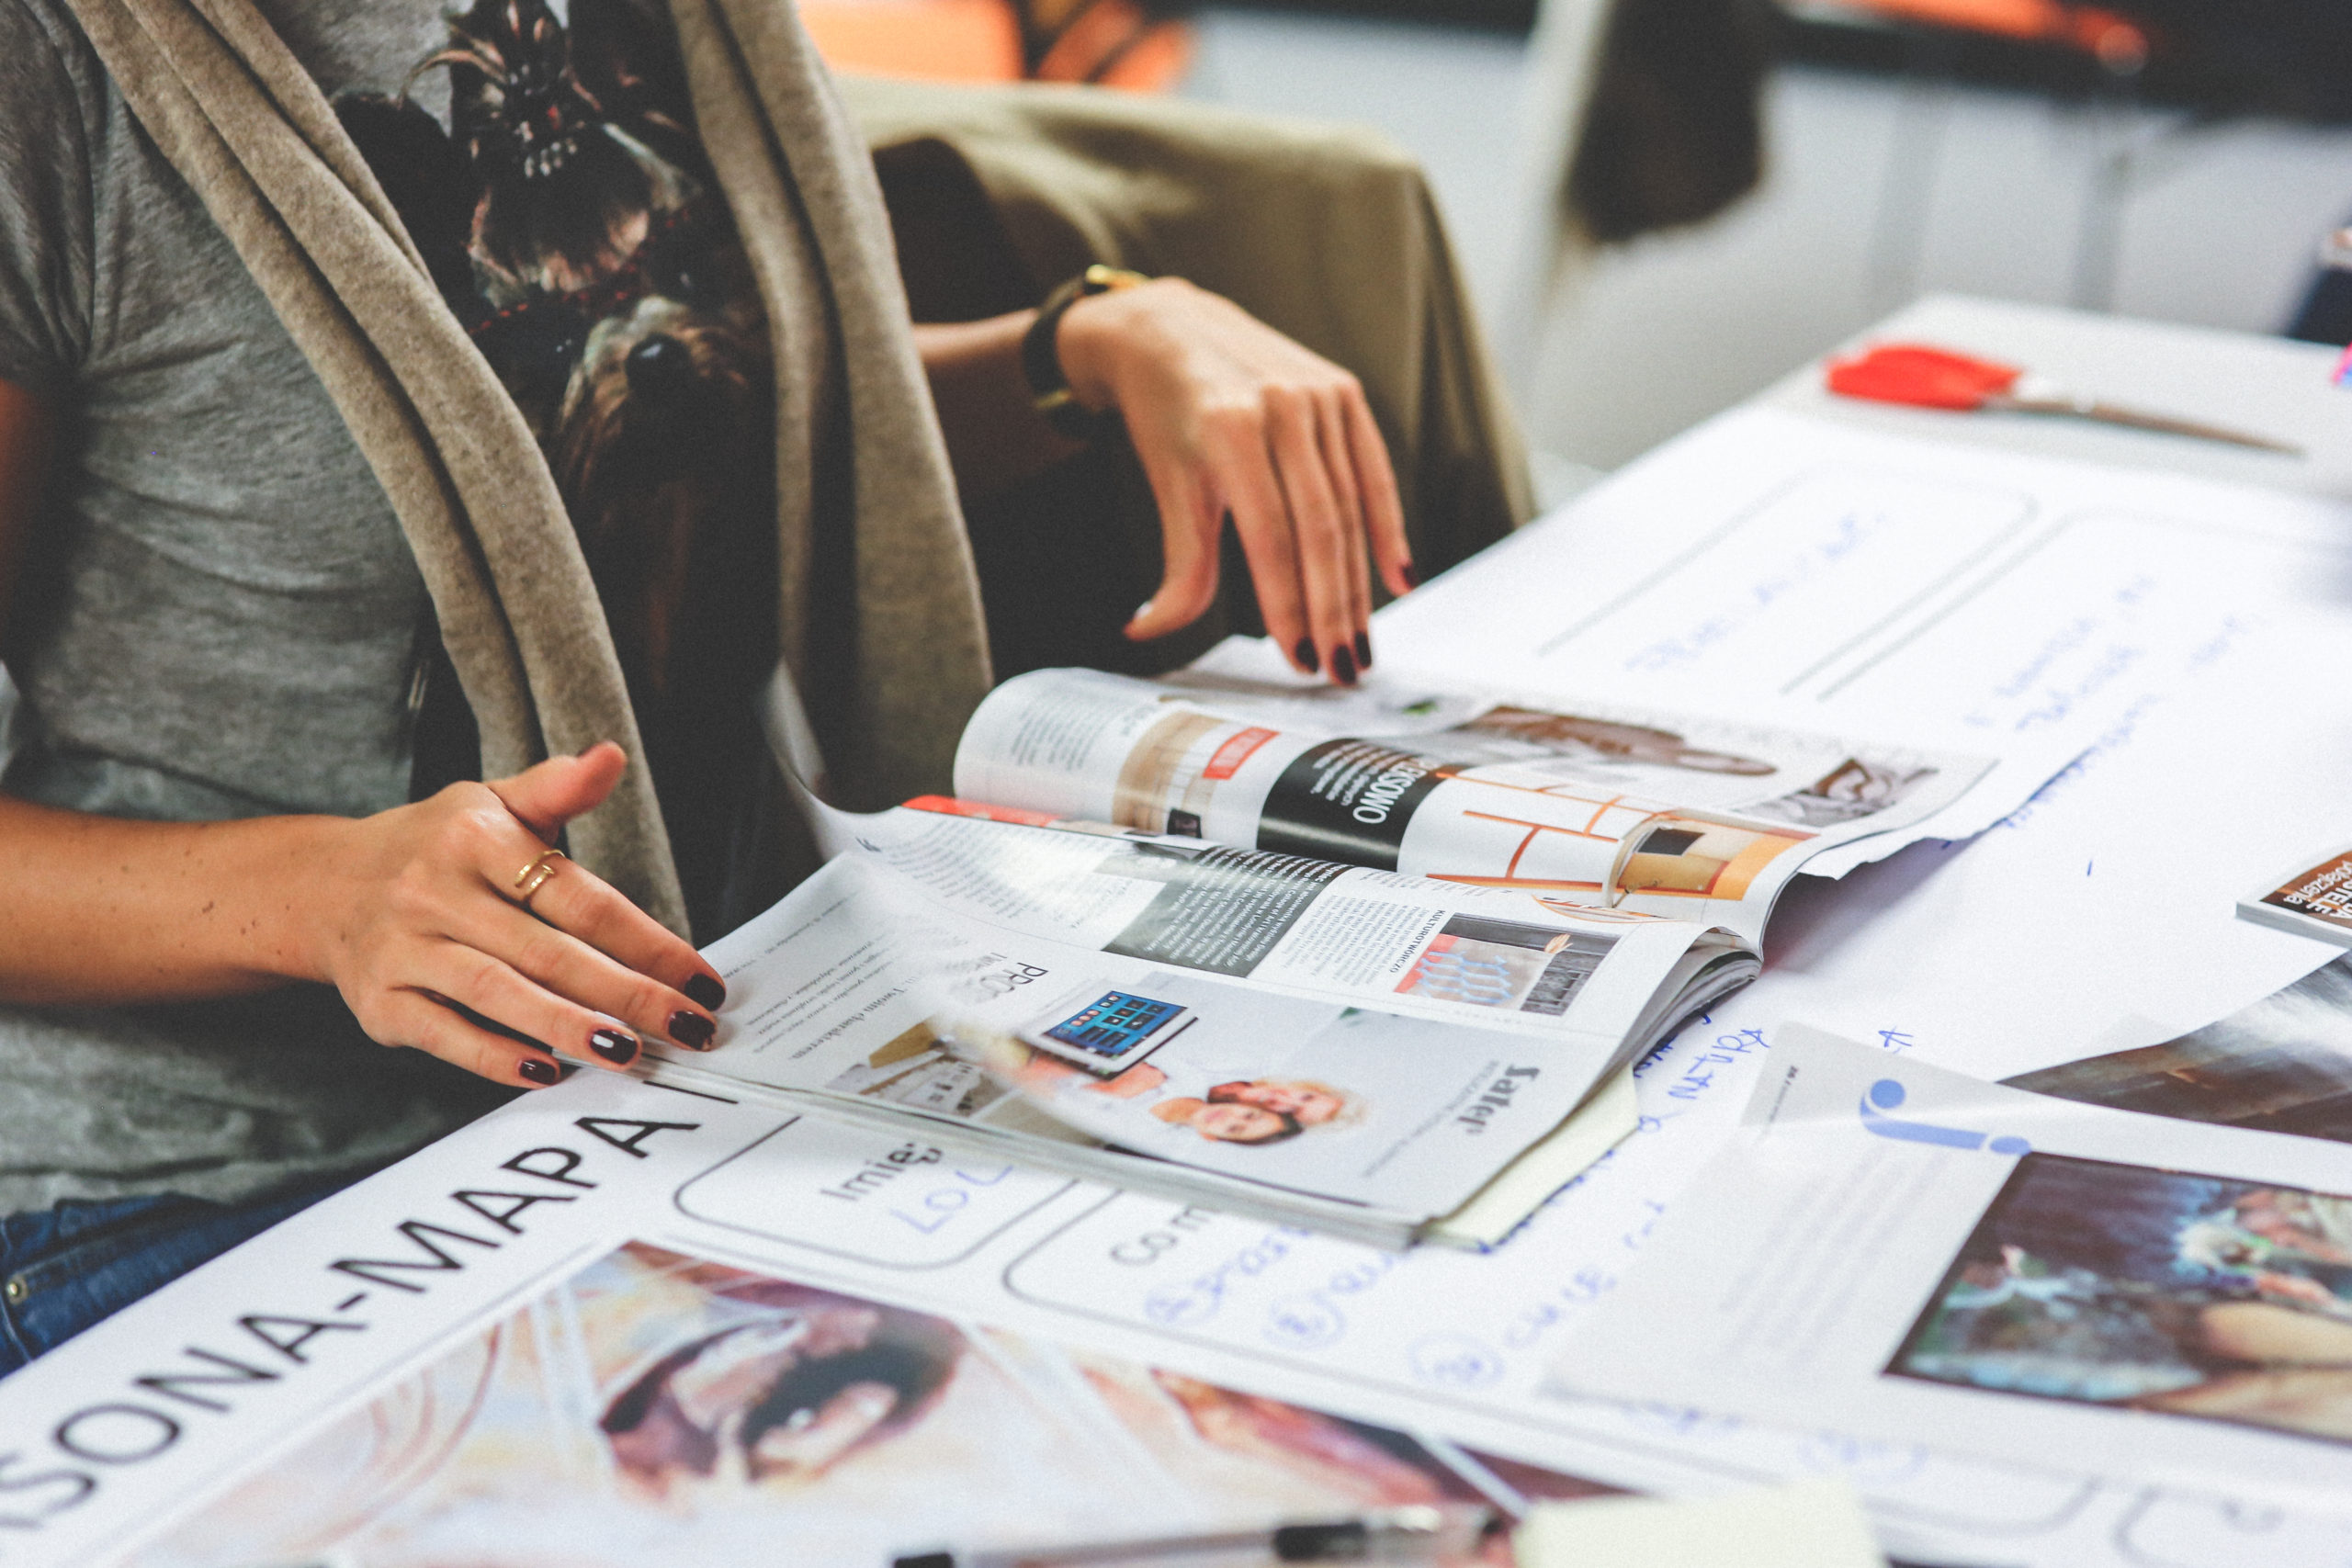 Subscription-based business model